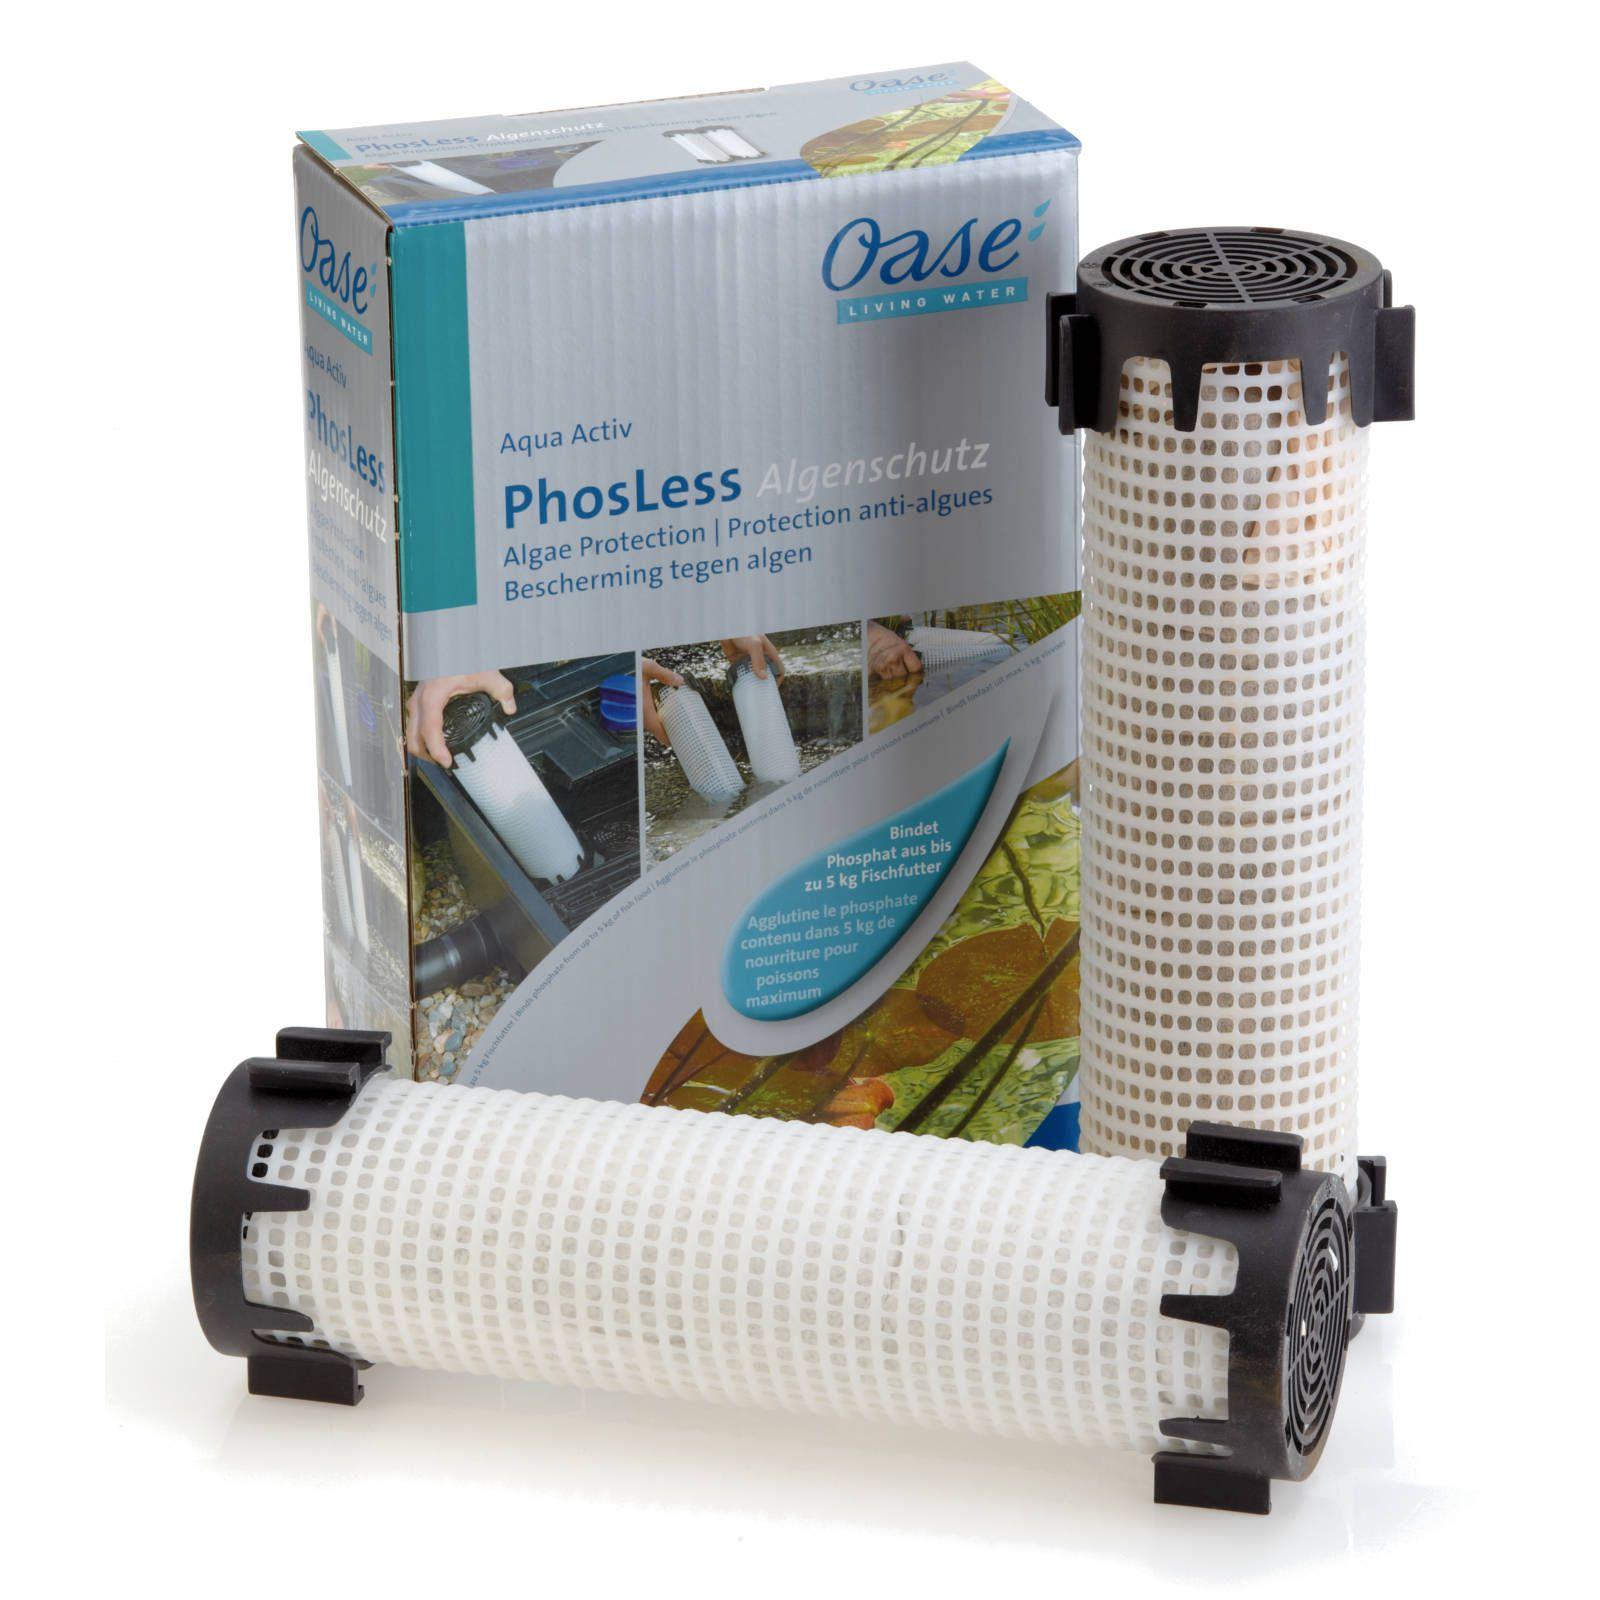 Oase AquaActiv PhosLess Algenschutz 2 Säulen je 1 L